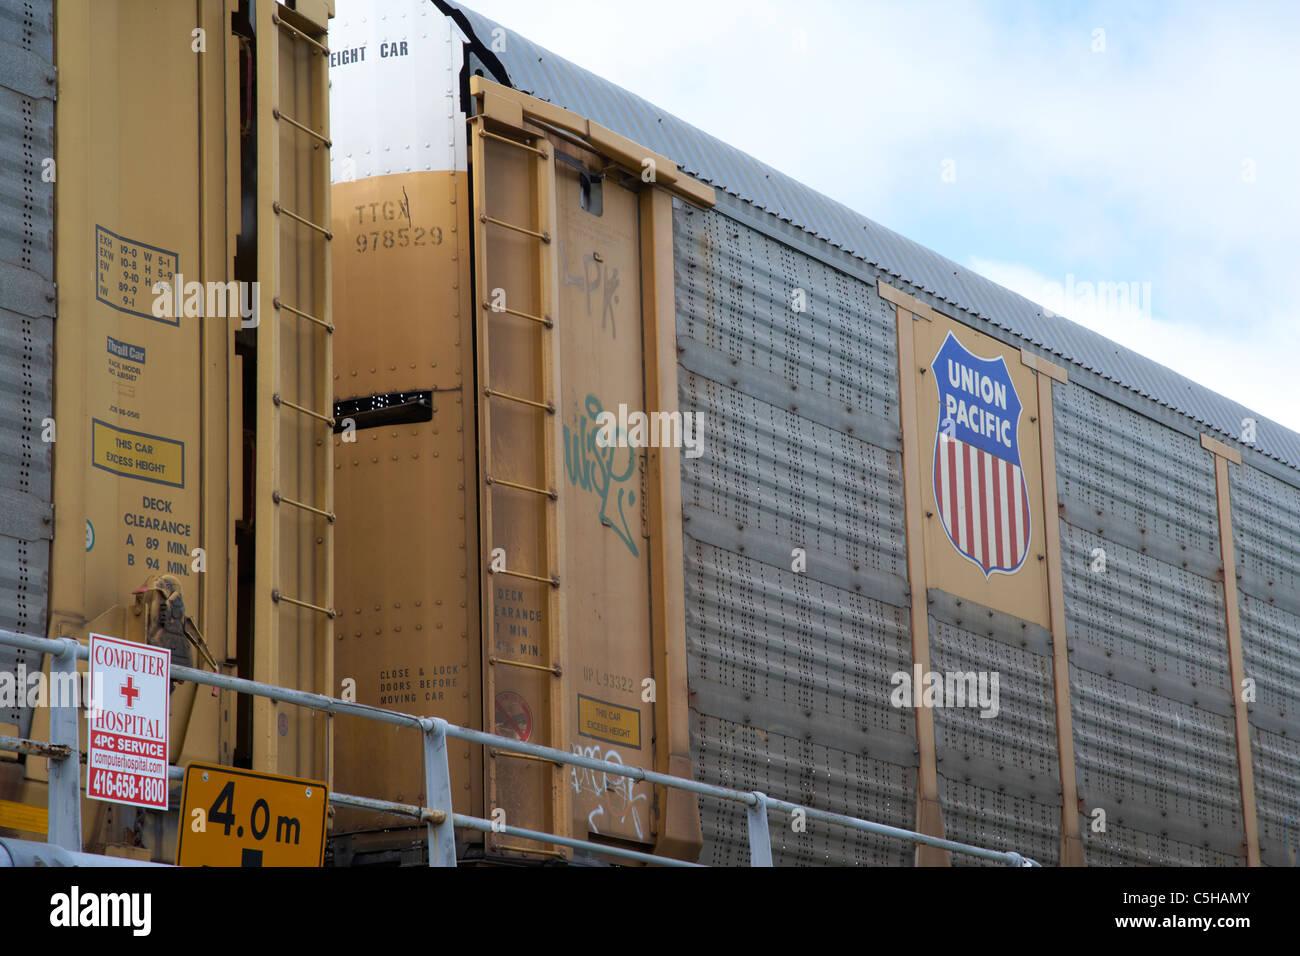 union pacific railroad railway car toronto ontario canada - Stock Image